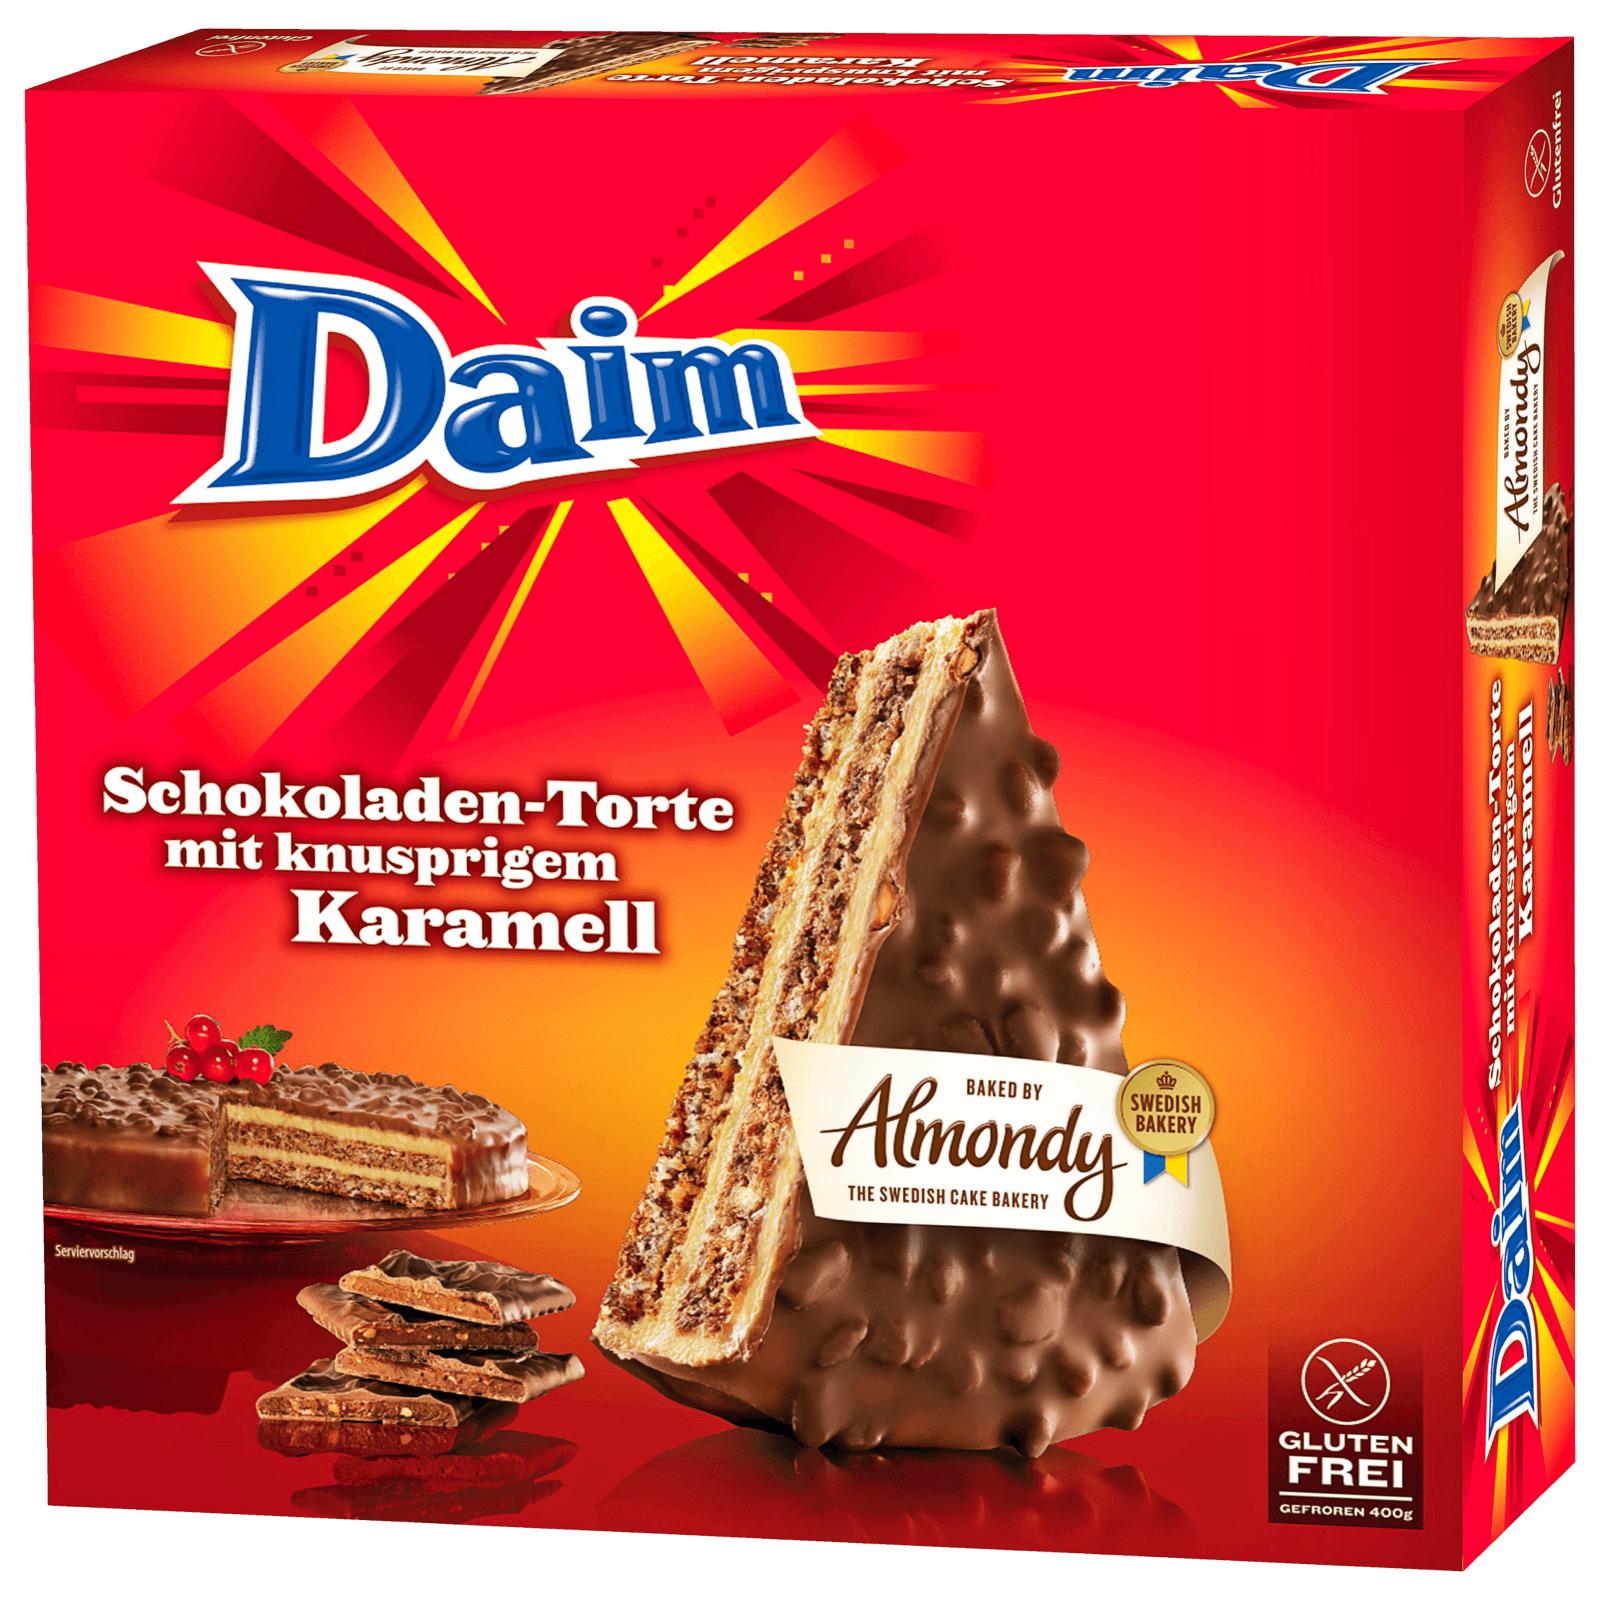 Almondy Daim Schokoladen-Torte (regional / lokal)